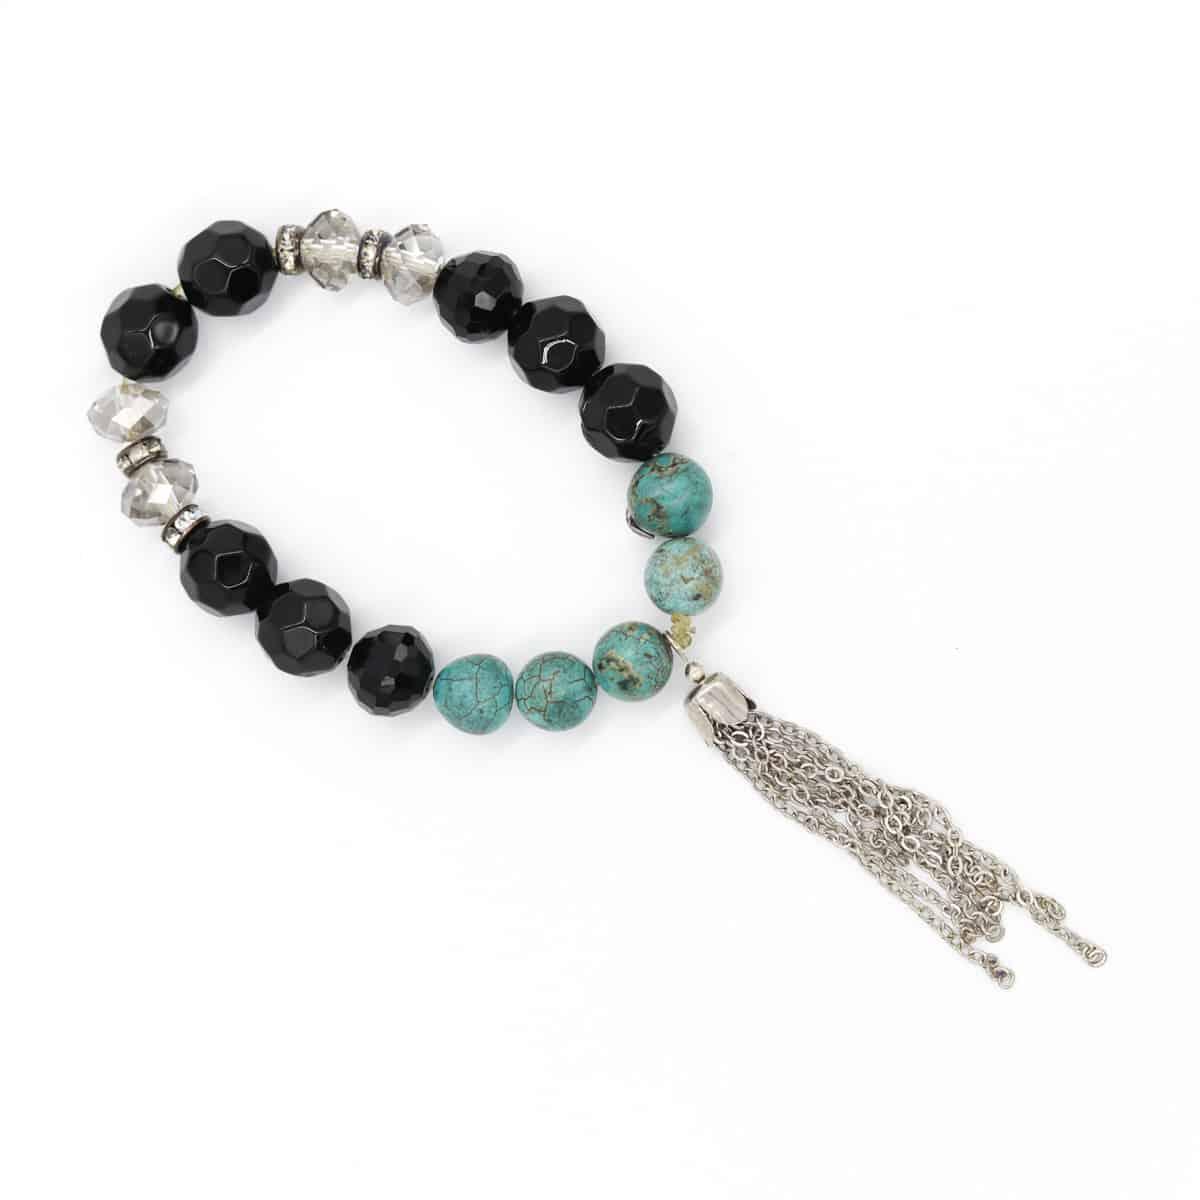 Turquoise And Black Aztec Moonrock Swarovski Crystal Stretch Bracelet By BJewel*Co